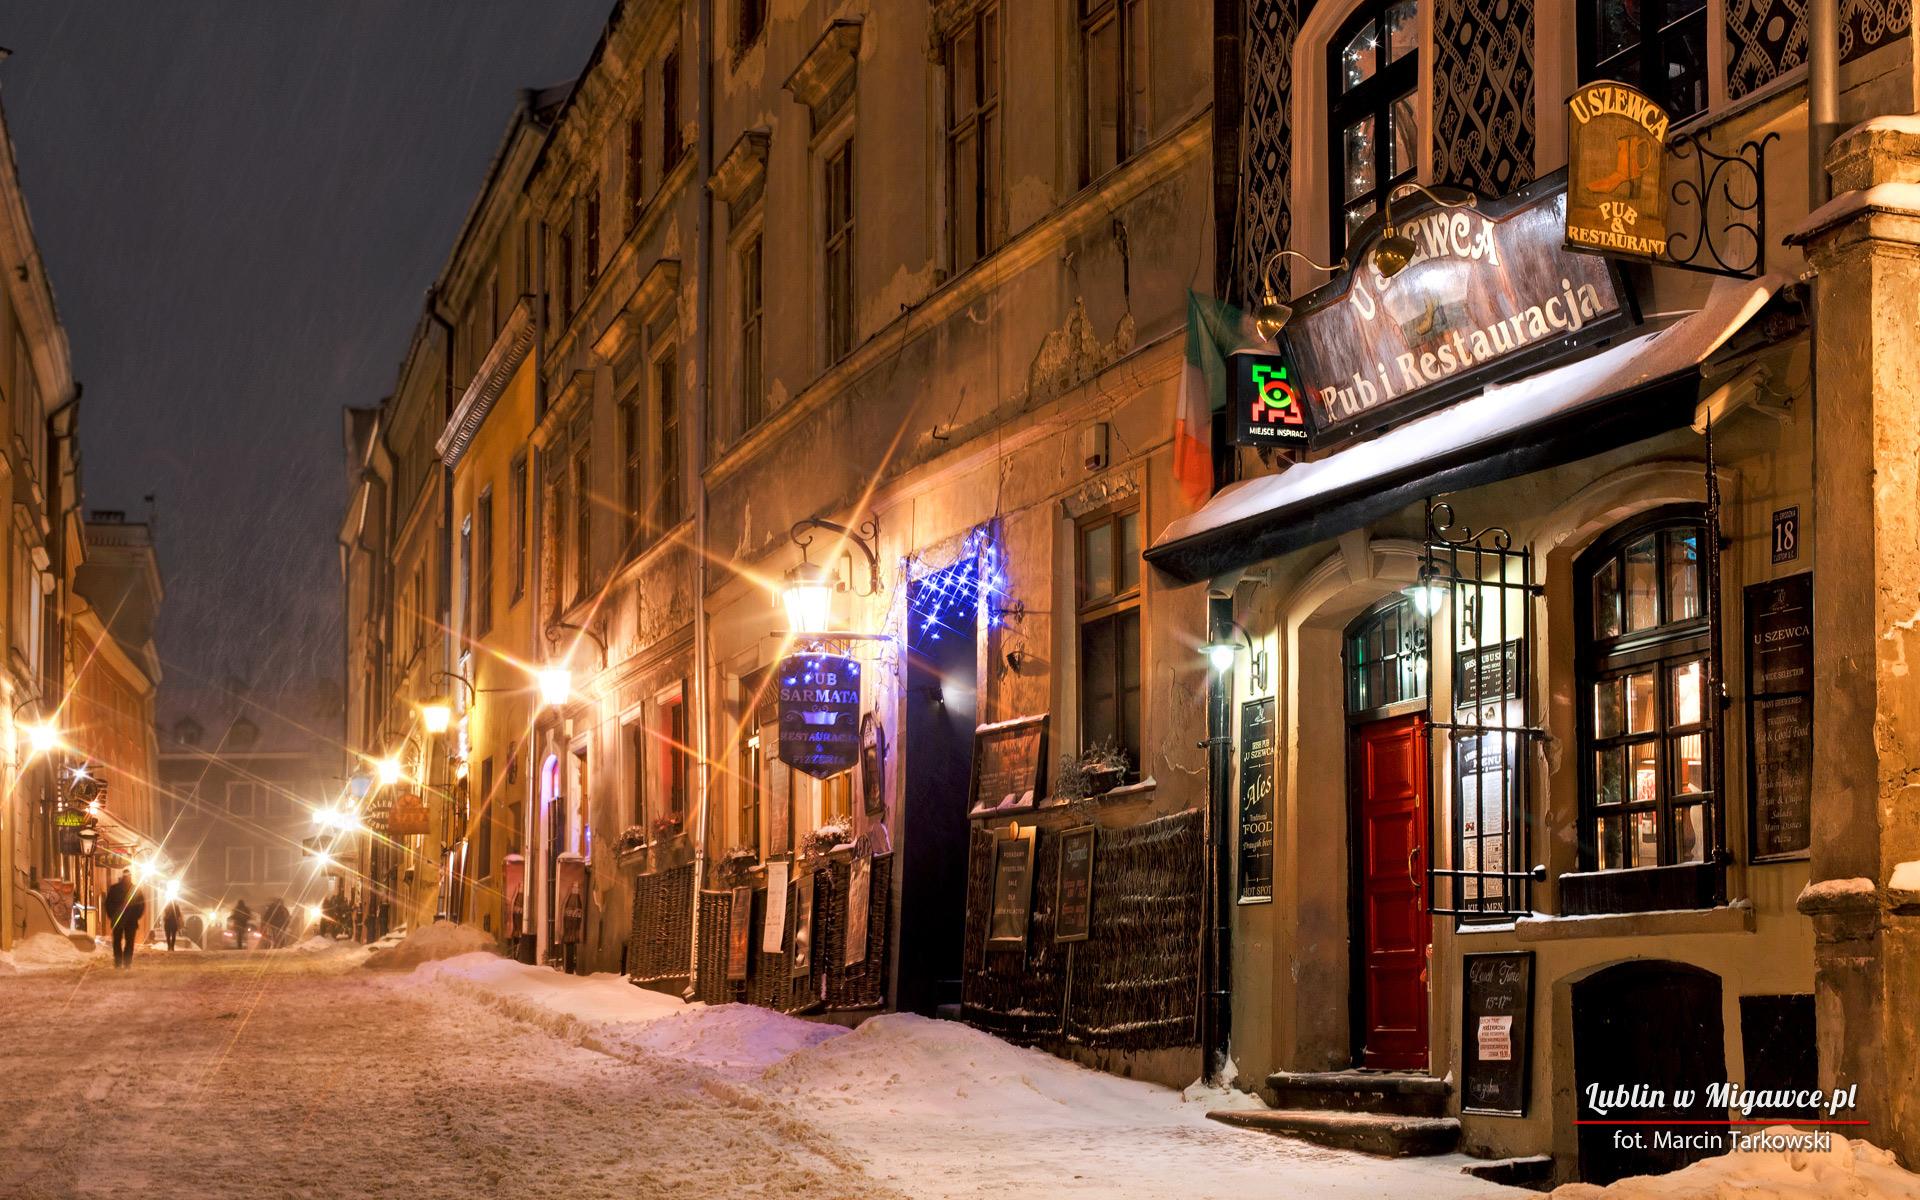 General 1920x1200 Lublin Poland Polish cityscape Tourism tourist Europe snow town calm snowing pub